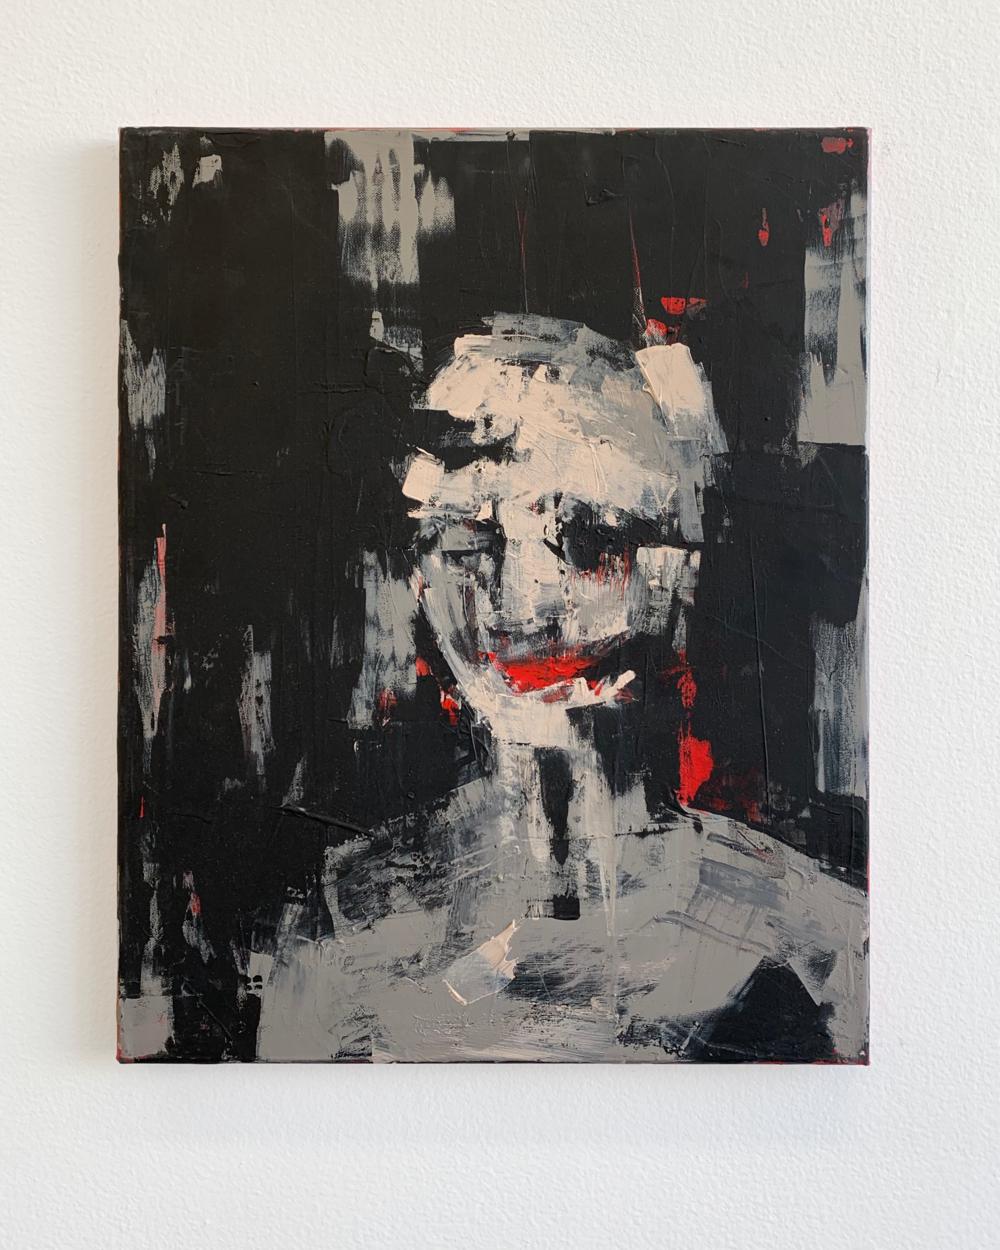 Moribund Outlivers VIII, 2019